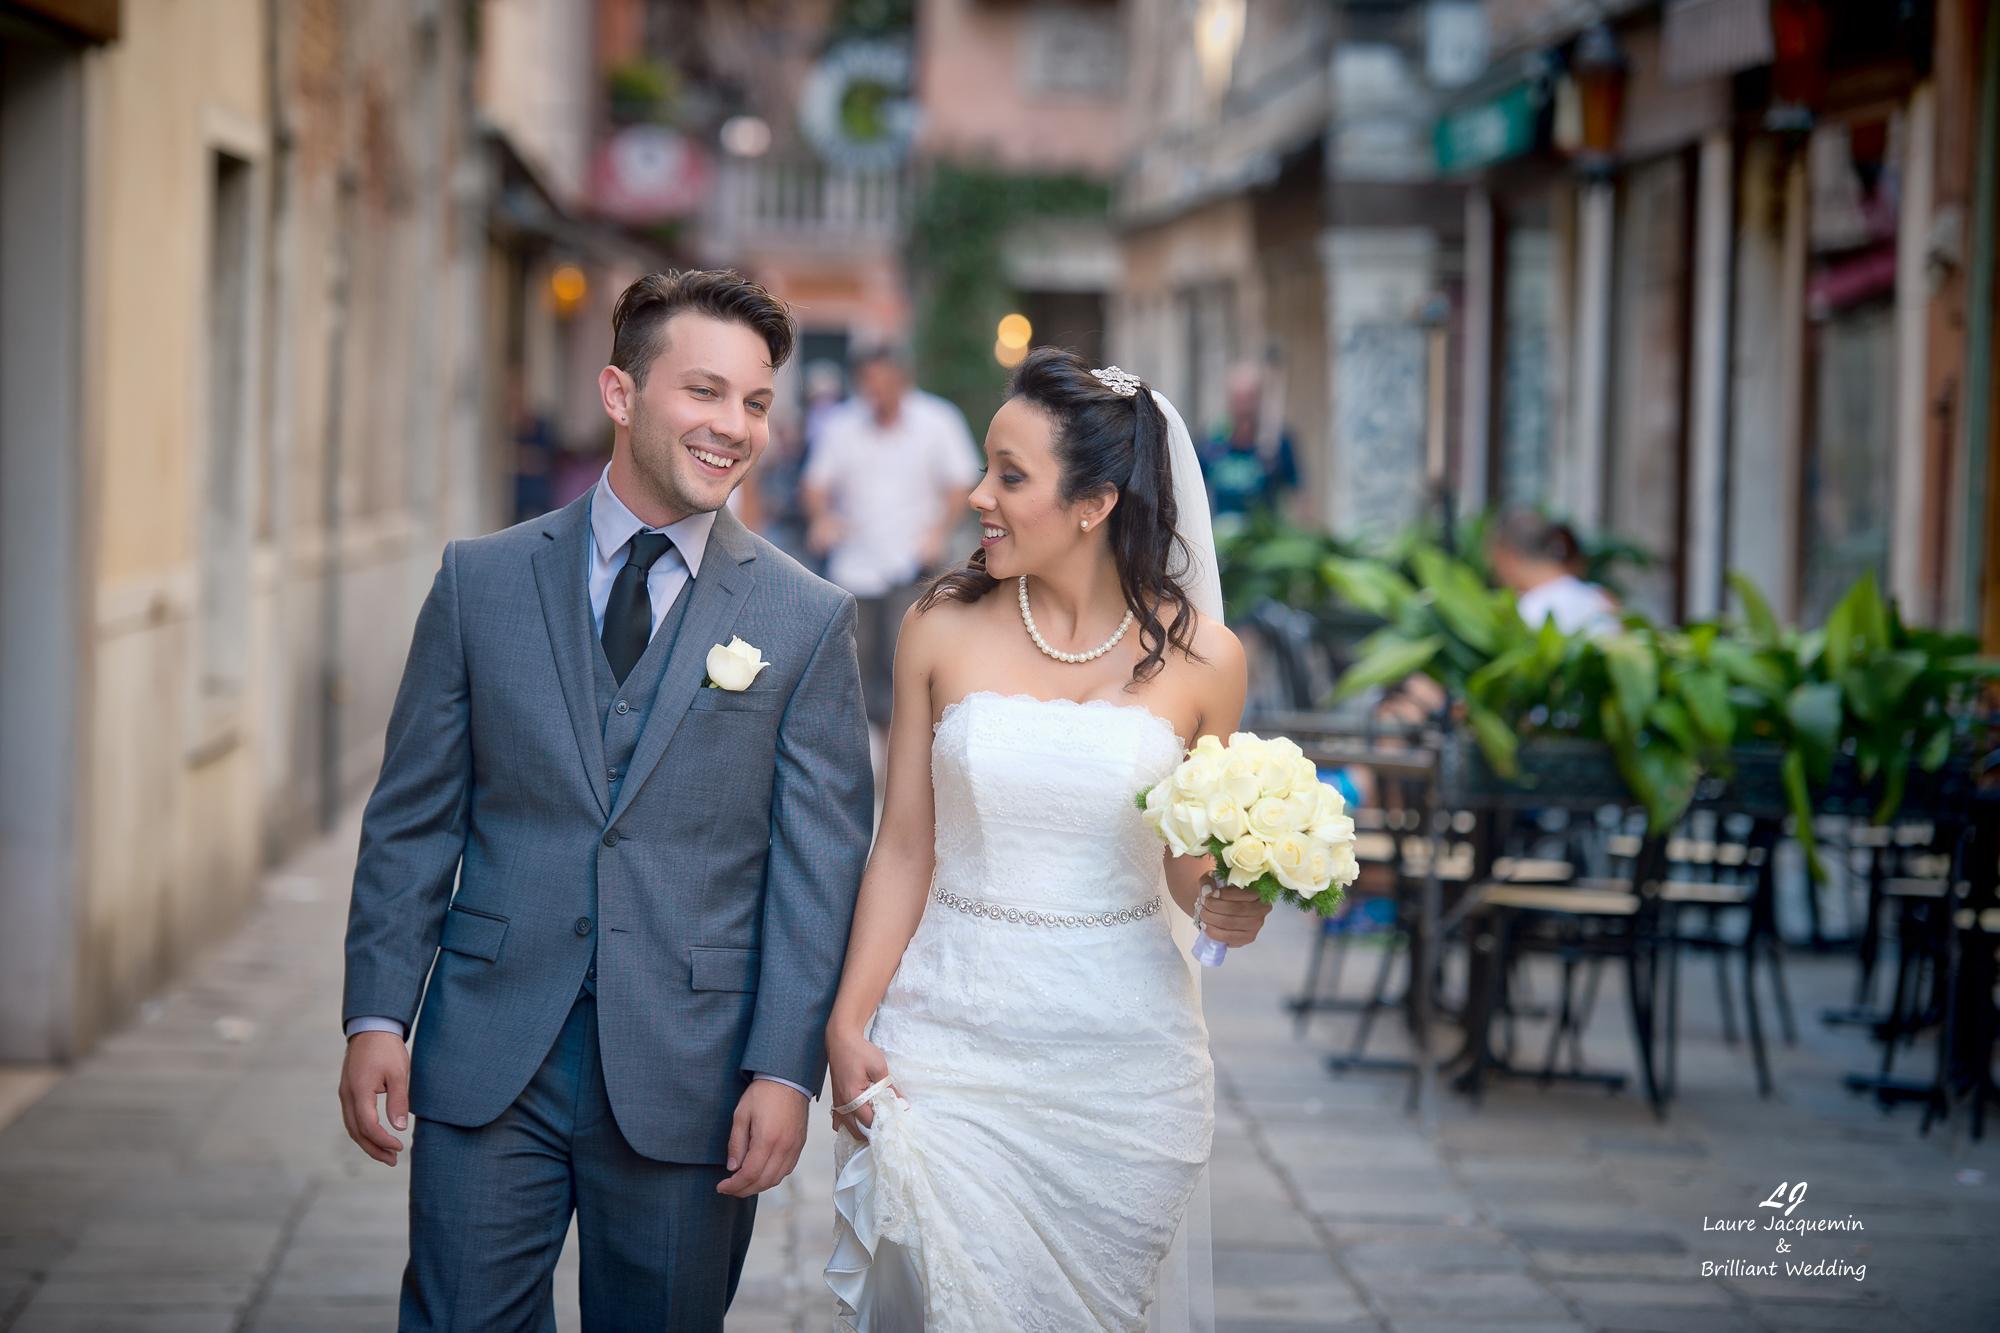 Venice Simbolic Wedding gondola venice Italy laure jacquemin photography (8) copia